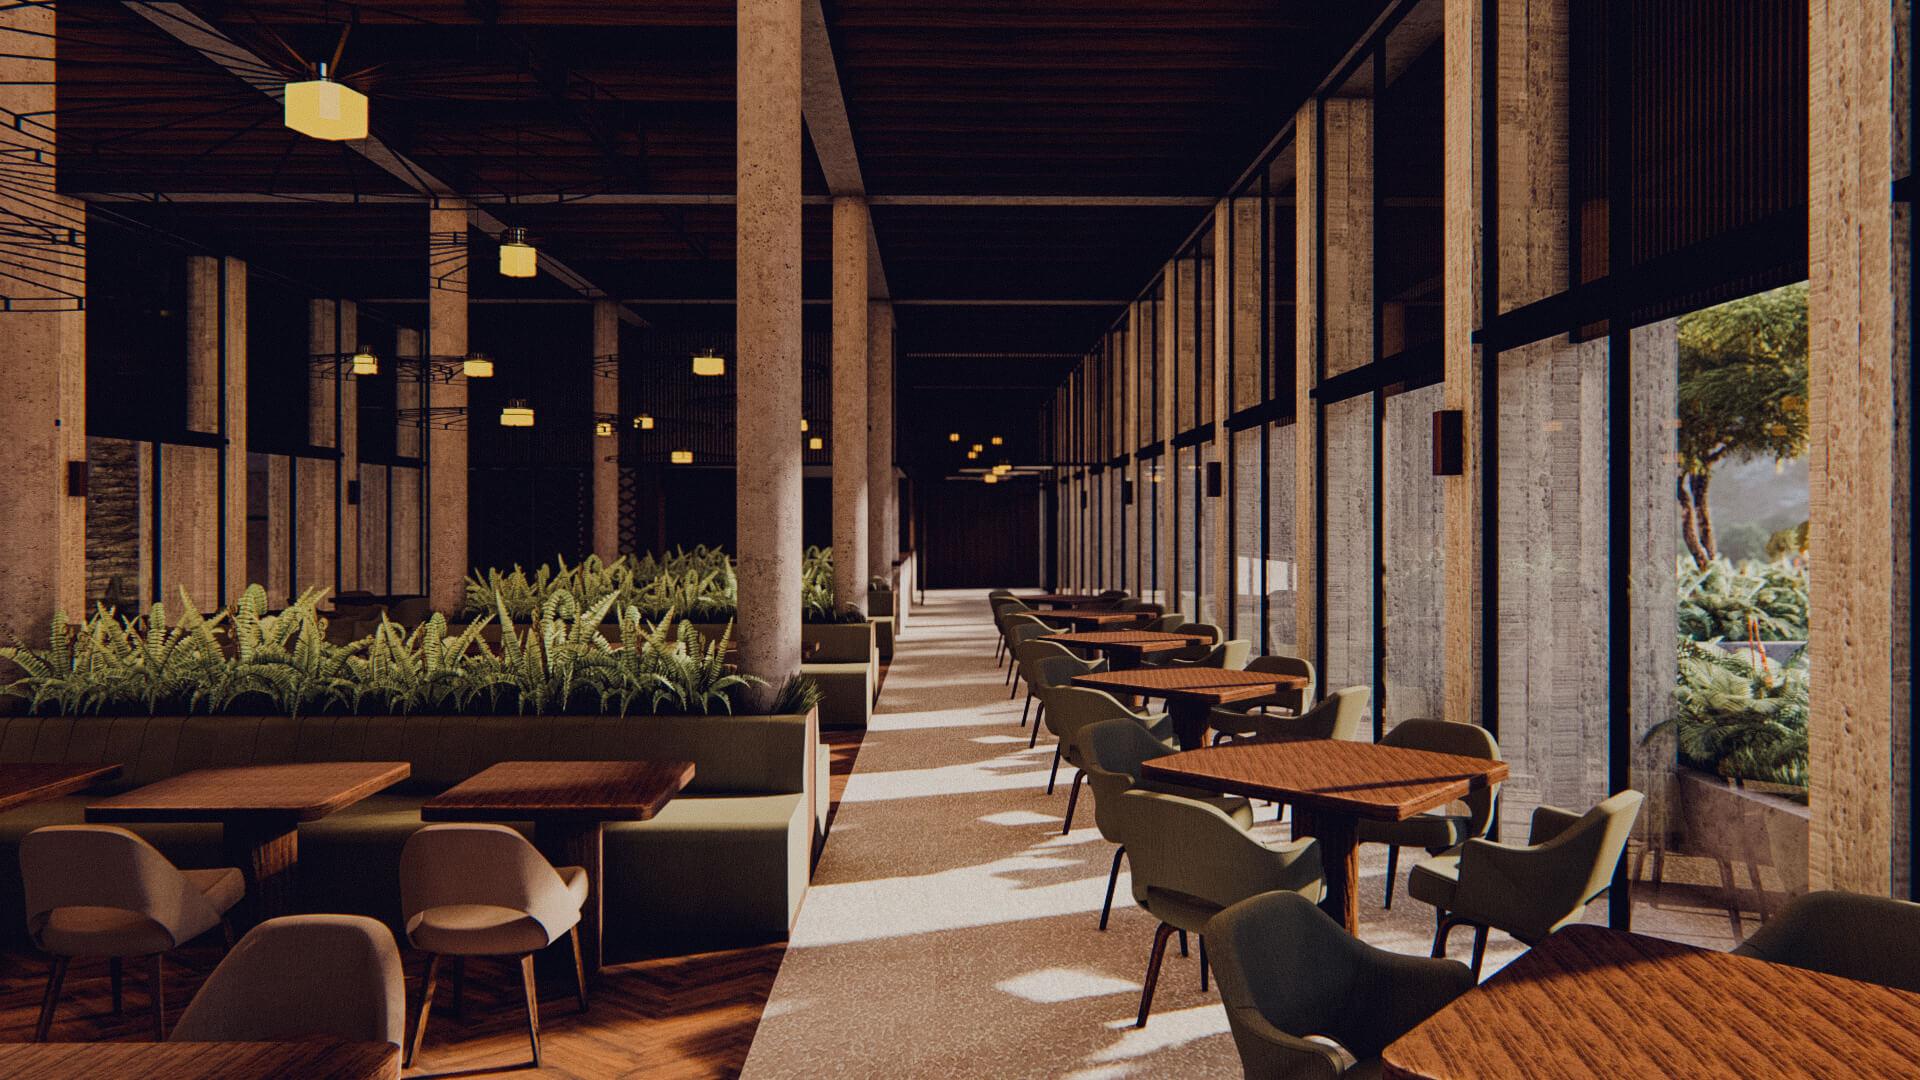 Resort Hotel Indoor Dining Lombok Bali Architect 01